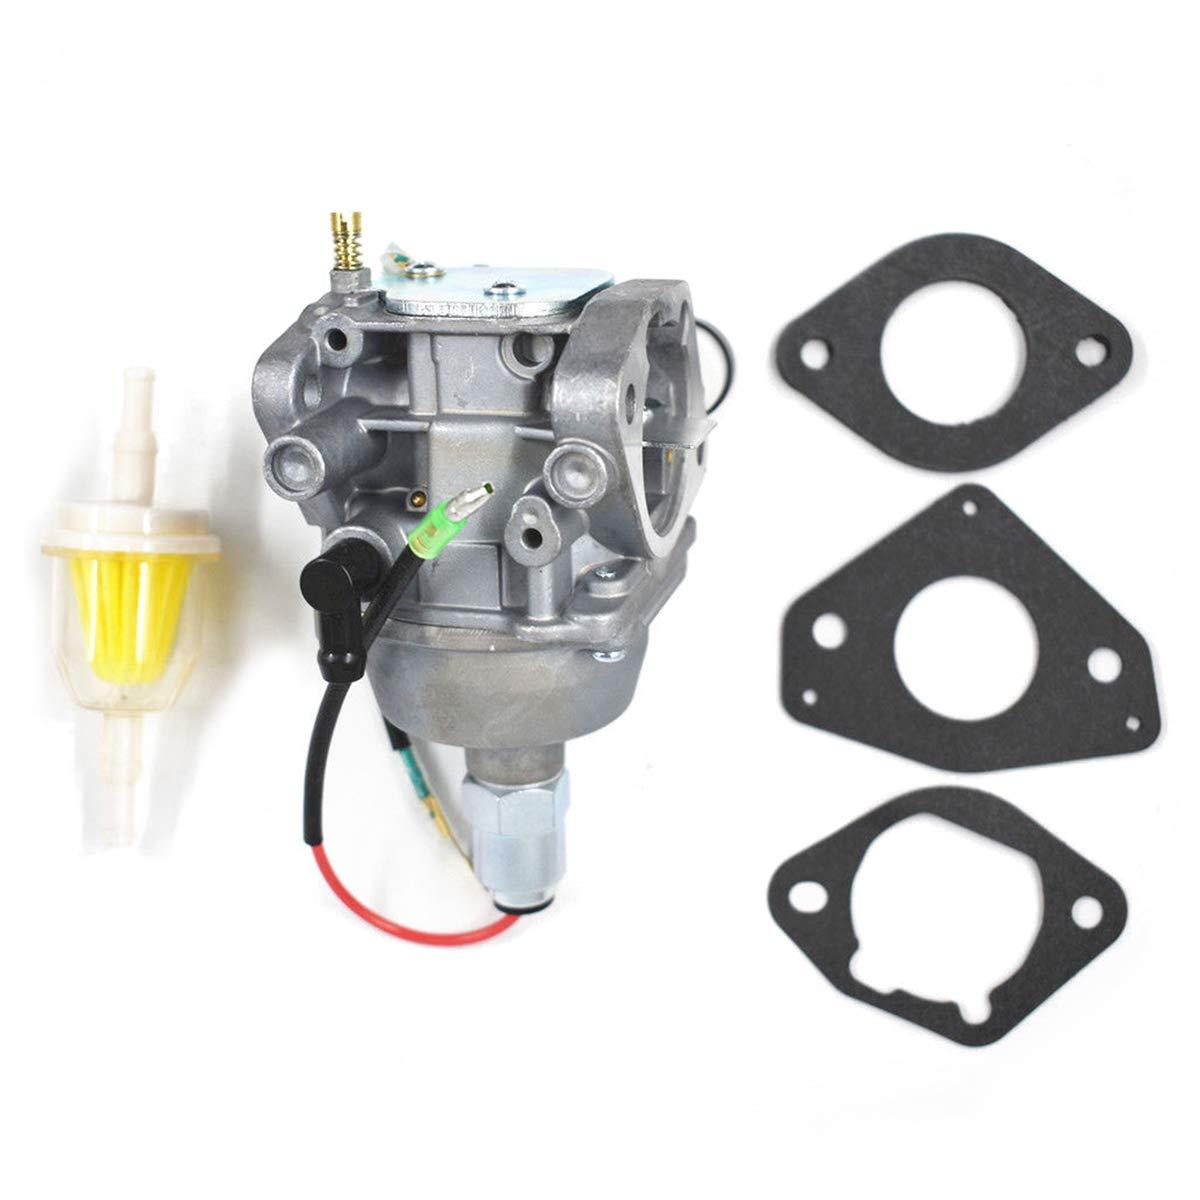 Replace Carb Part NO. Triumilynn 24 853 169-S Carburetor Kit for Kohler Engines CV675 CV640 CV730 24853169-S//24-853-169 HAOCEHNG